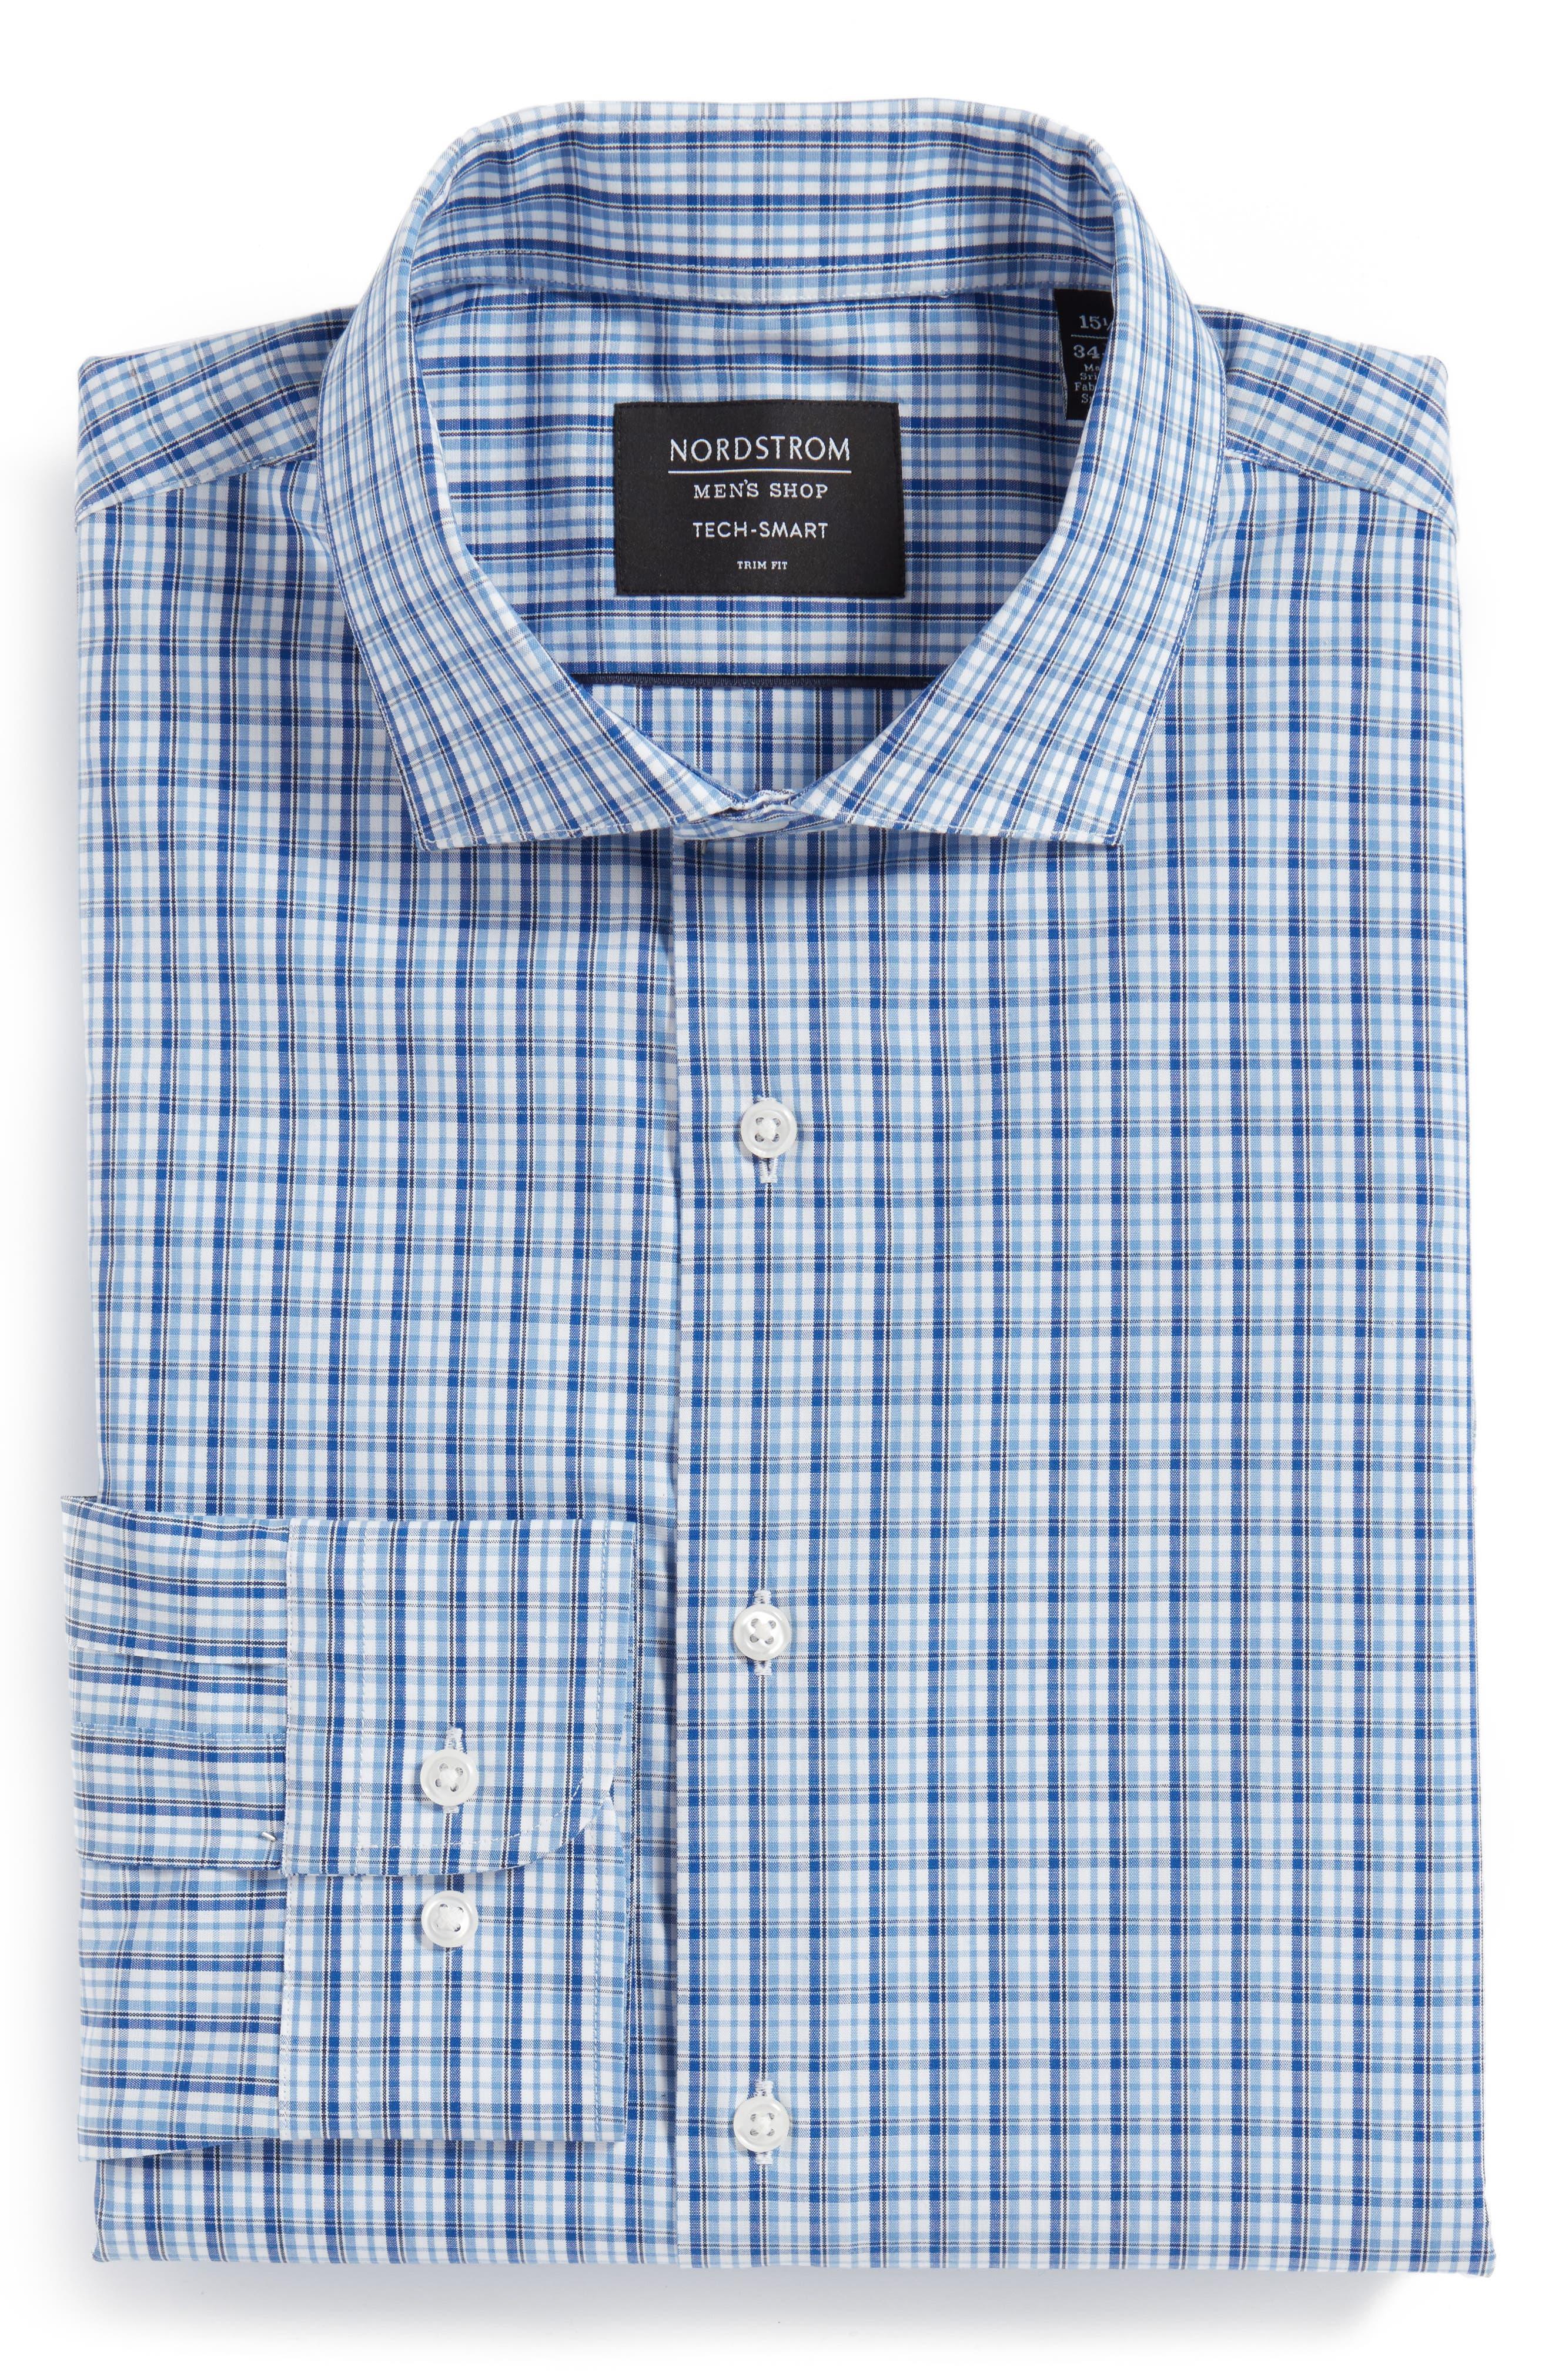 Alternate Image 4  - Nordstrom Men's Shop Tech-Smart Trim Fit Stretch Plaid Dress Shirt